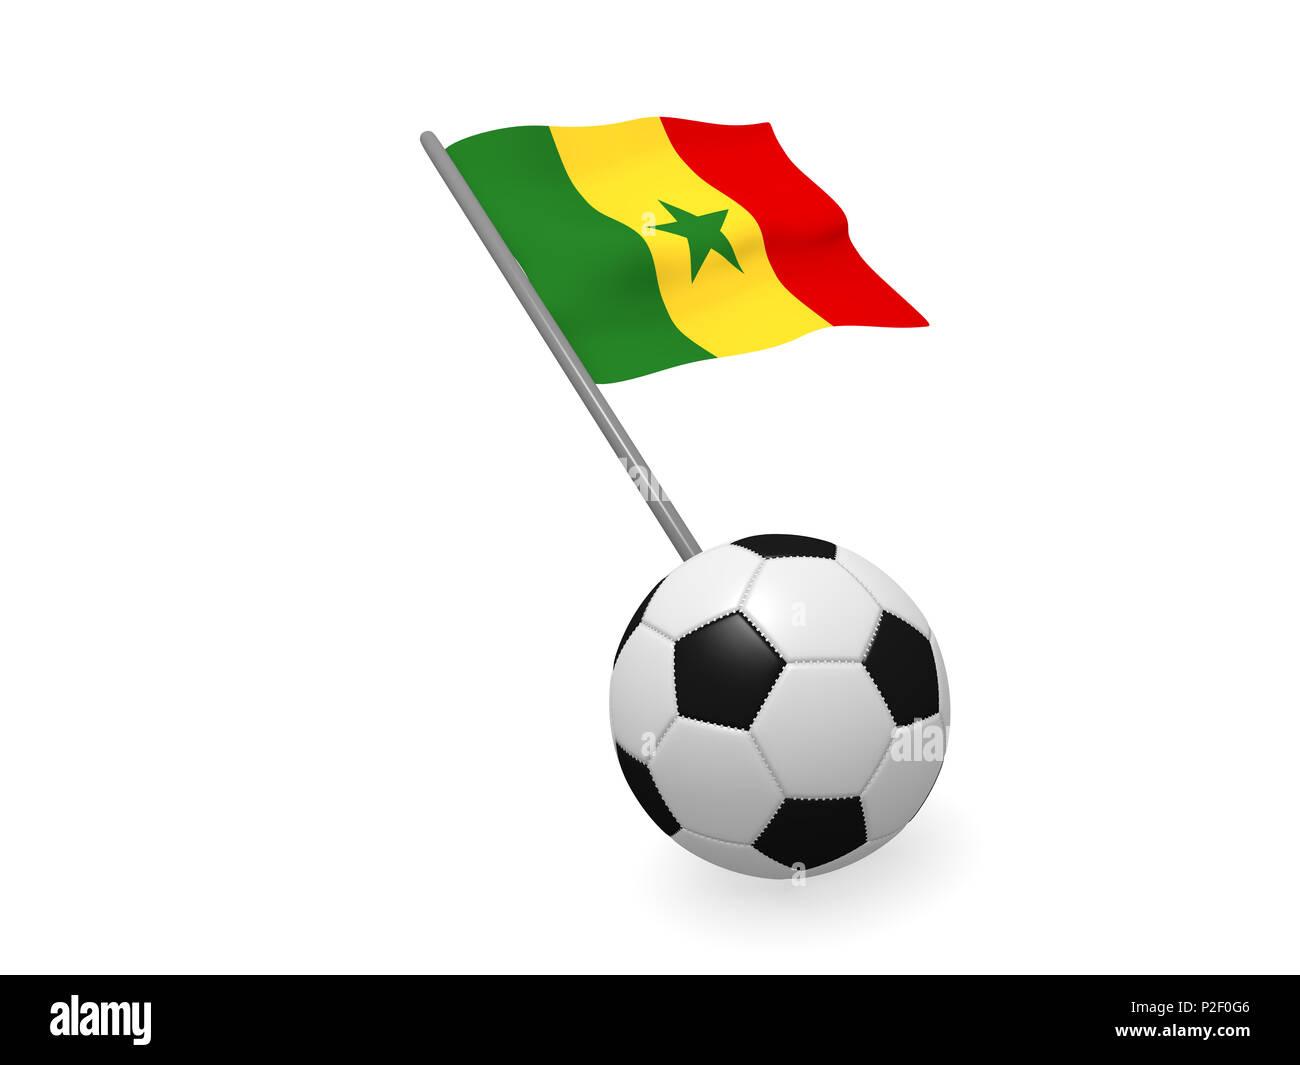 0b1020826a8 Senegal Winner Stock Photos   Senegal Winner Stock Images - Alamy